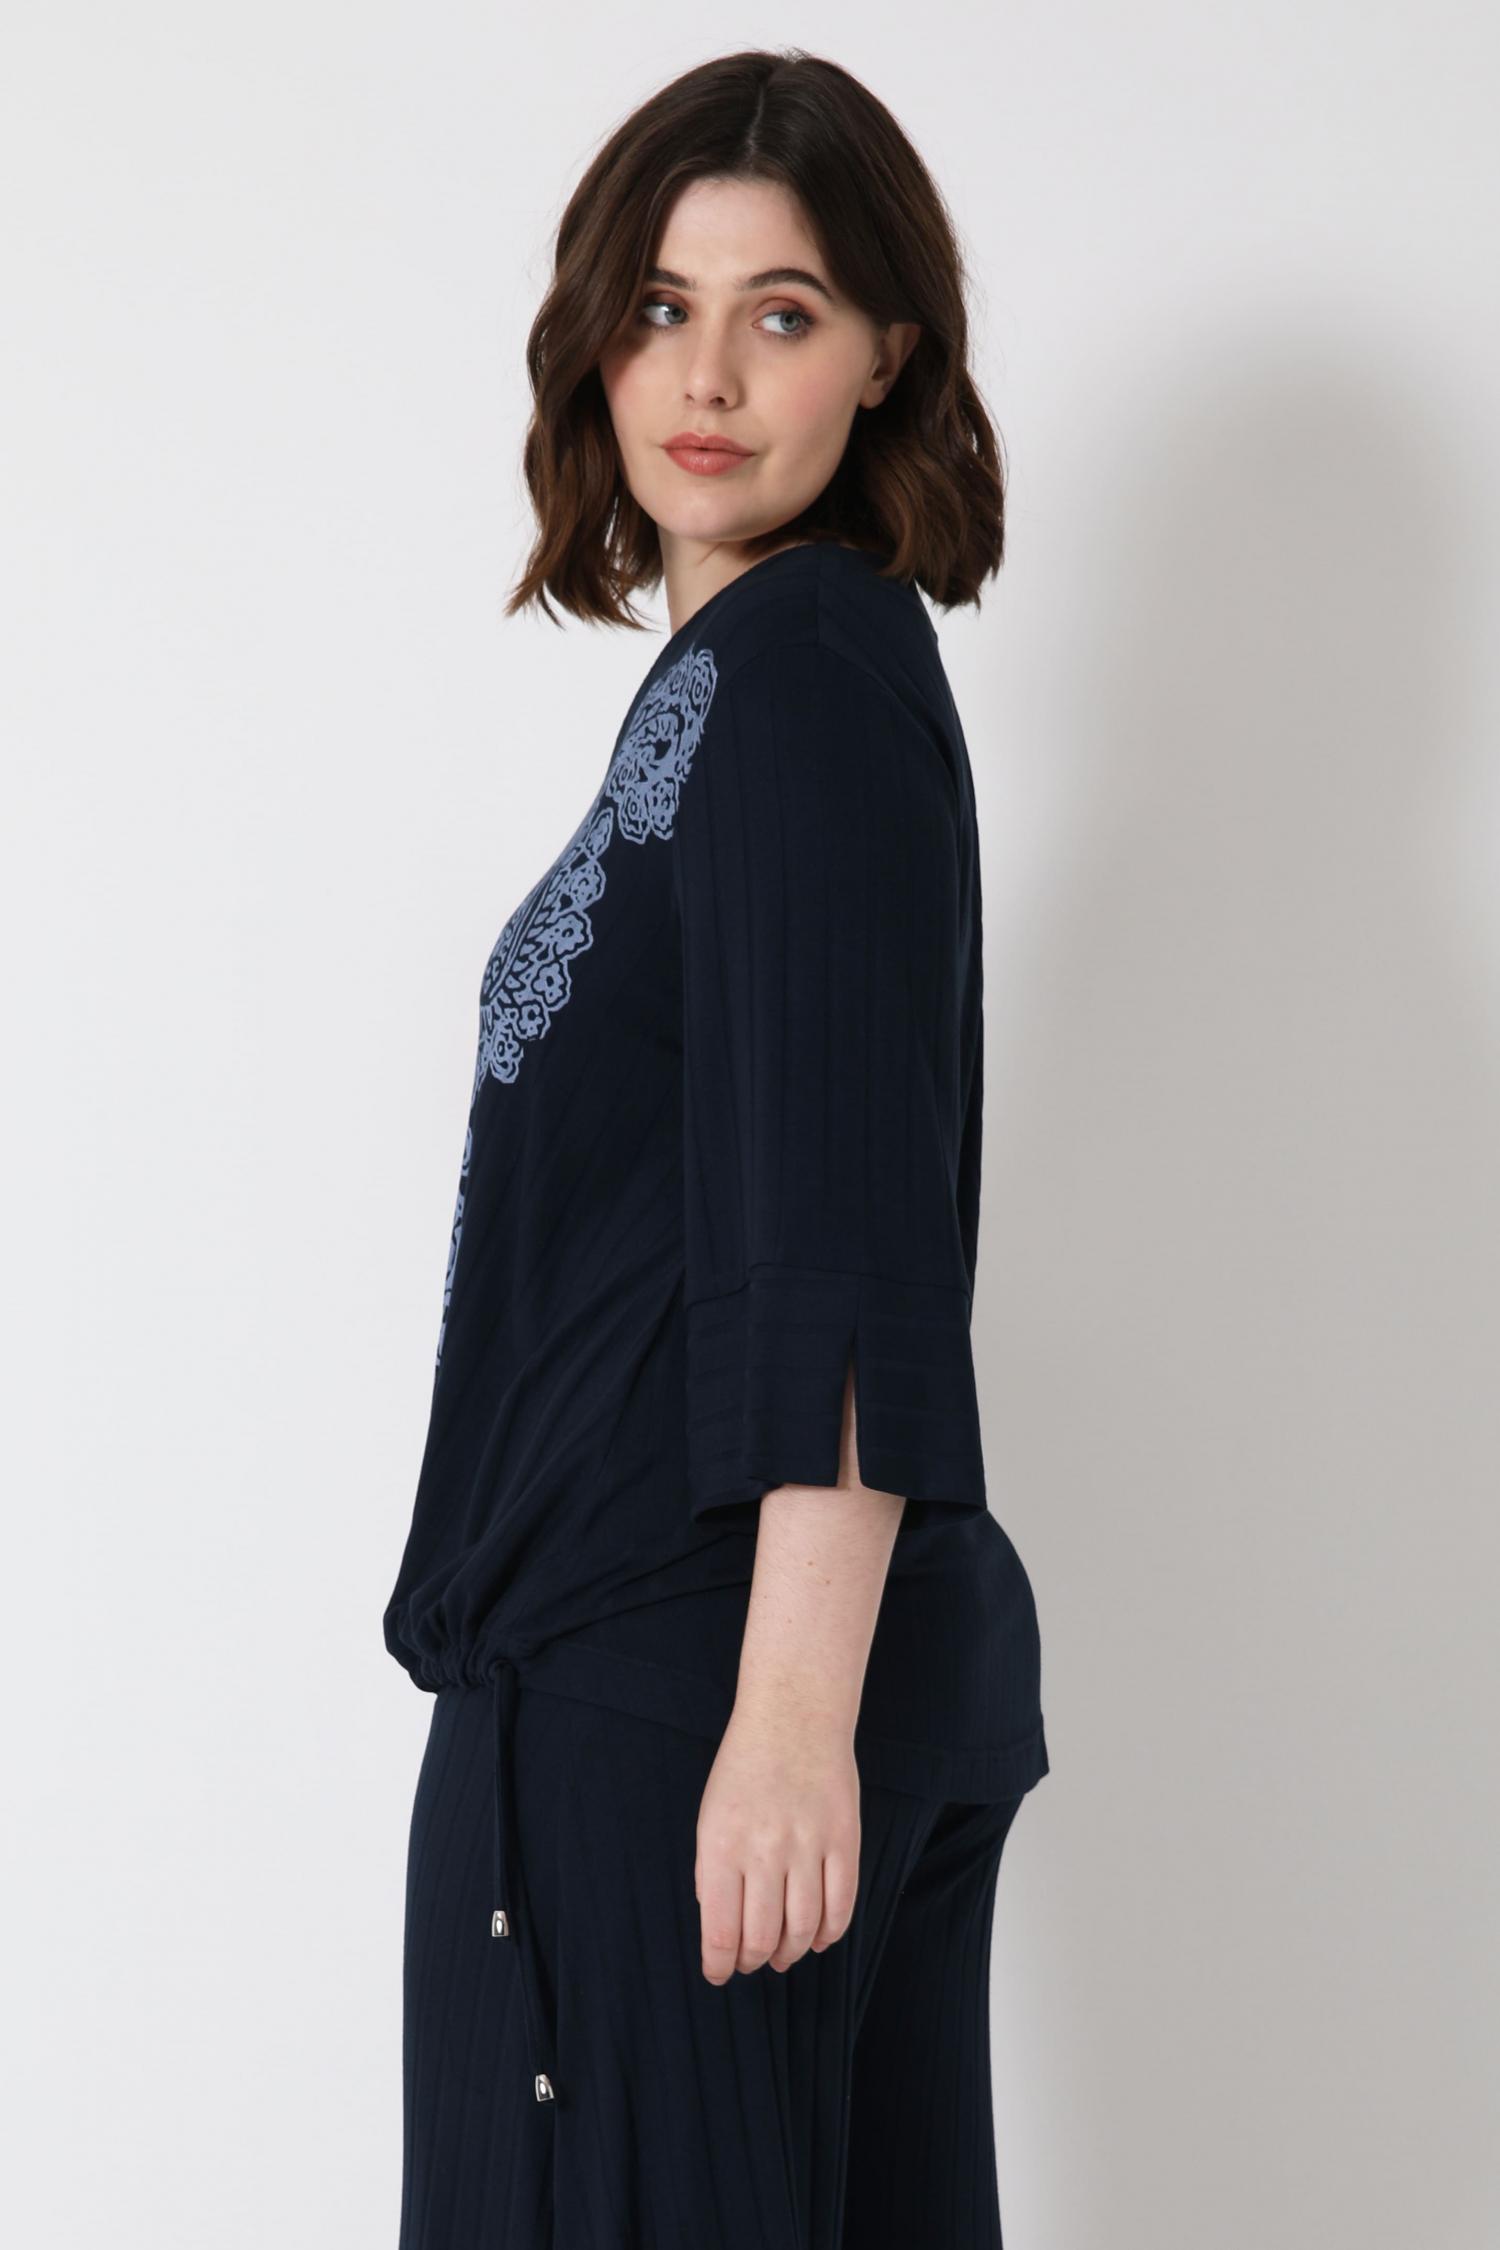 T-shirt in screen-printed plain rib